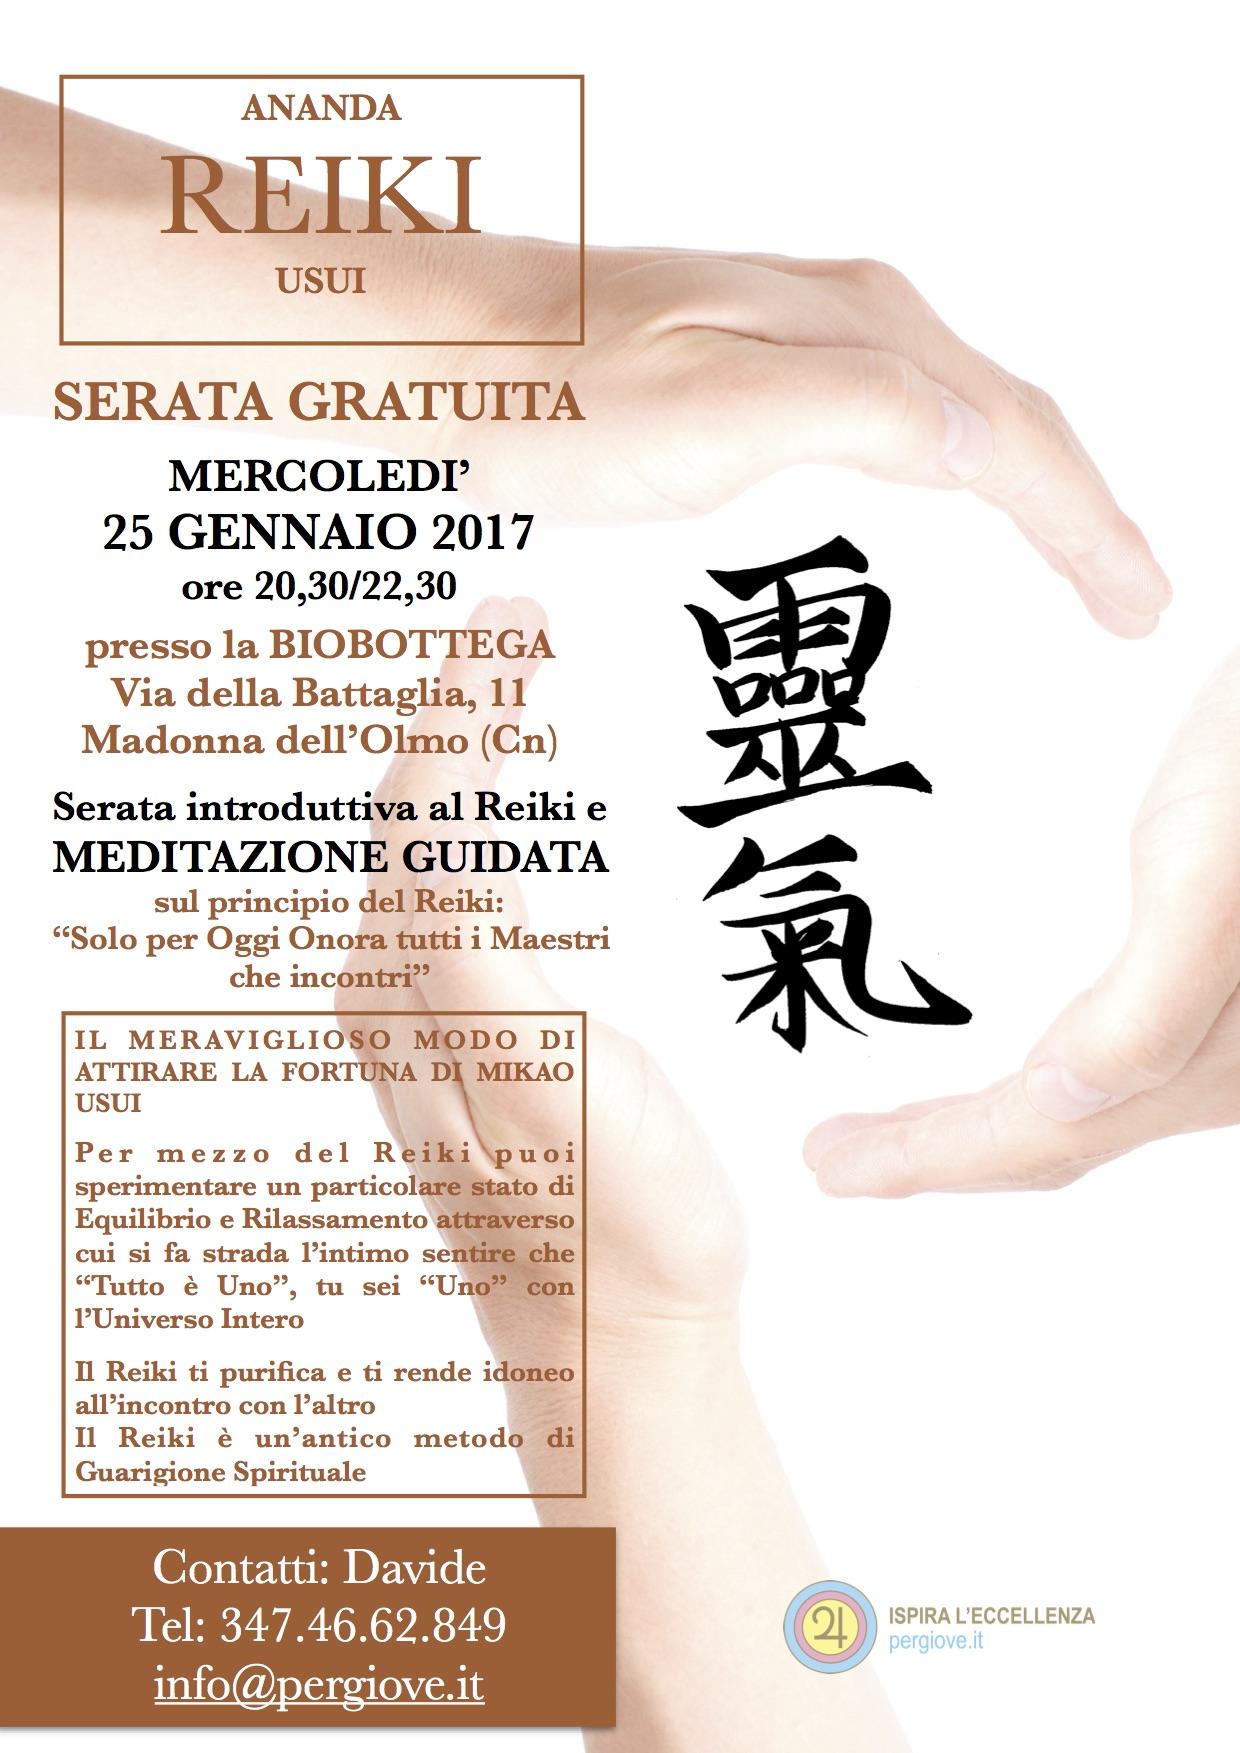 Cuneo Reiki 2017, 2017 Reiki Cuneo, 25 Gennaio 2017 Reiki Gratis a Cuneo (Cn)